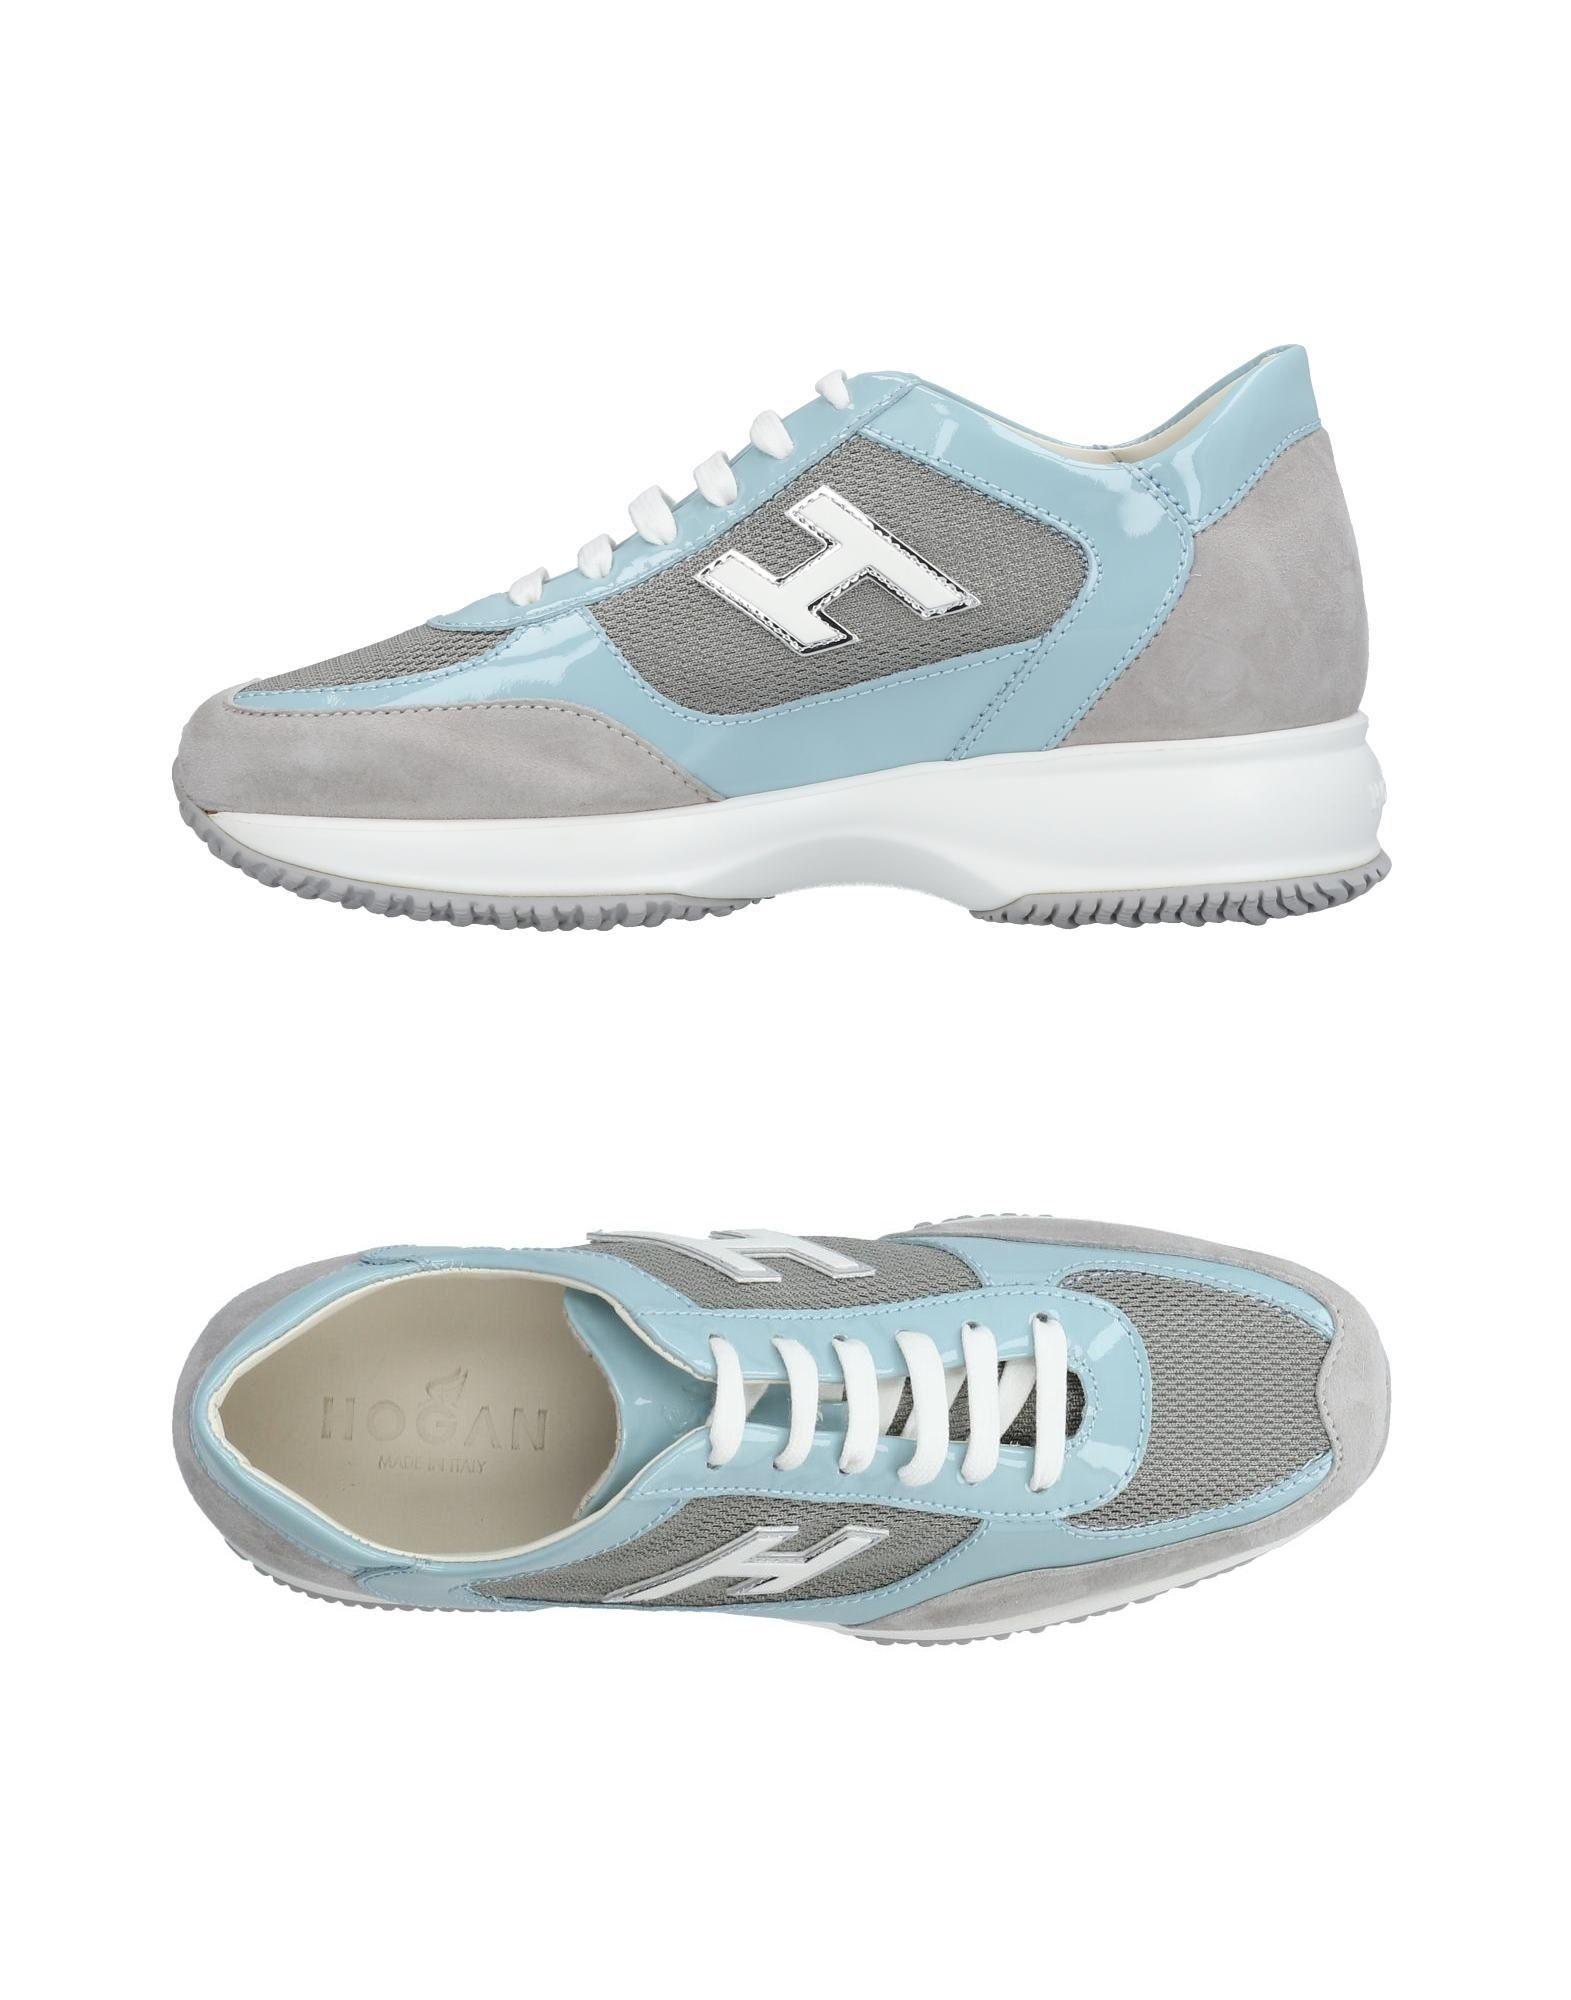 Acquista Sneakers su Hogan online Donna qqHErxav